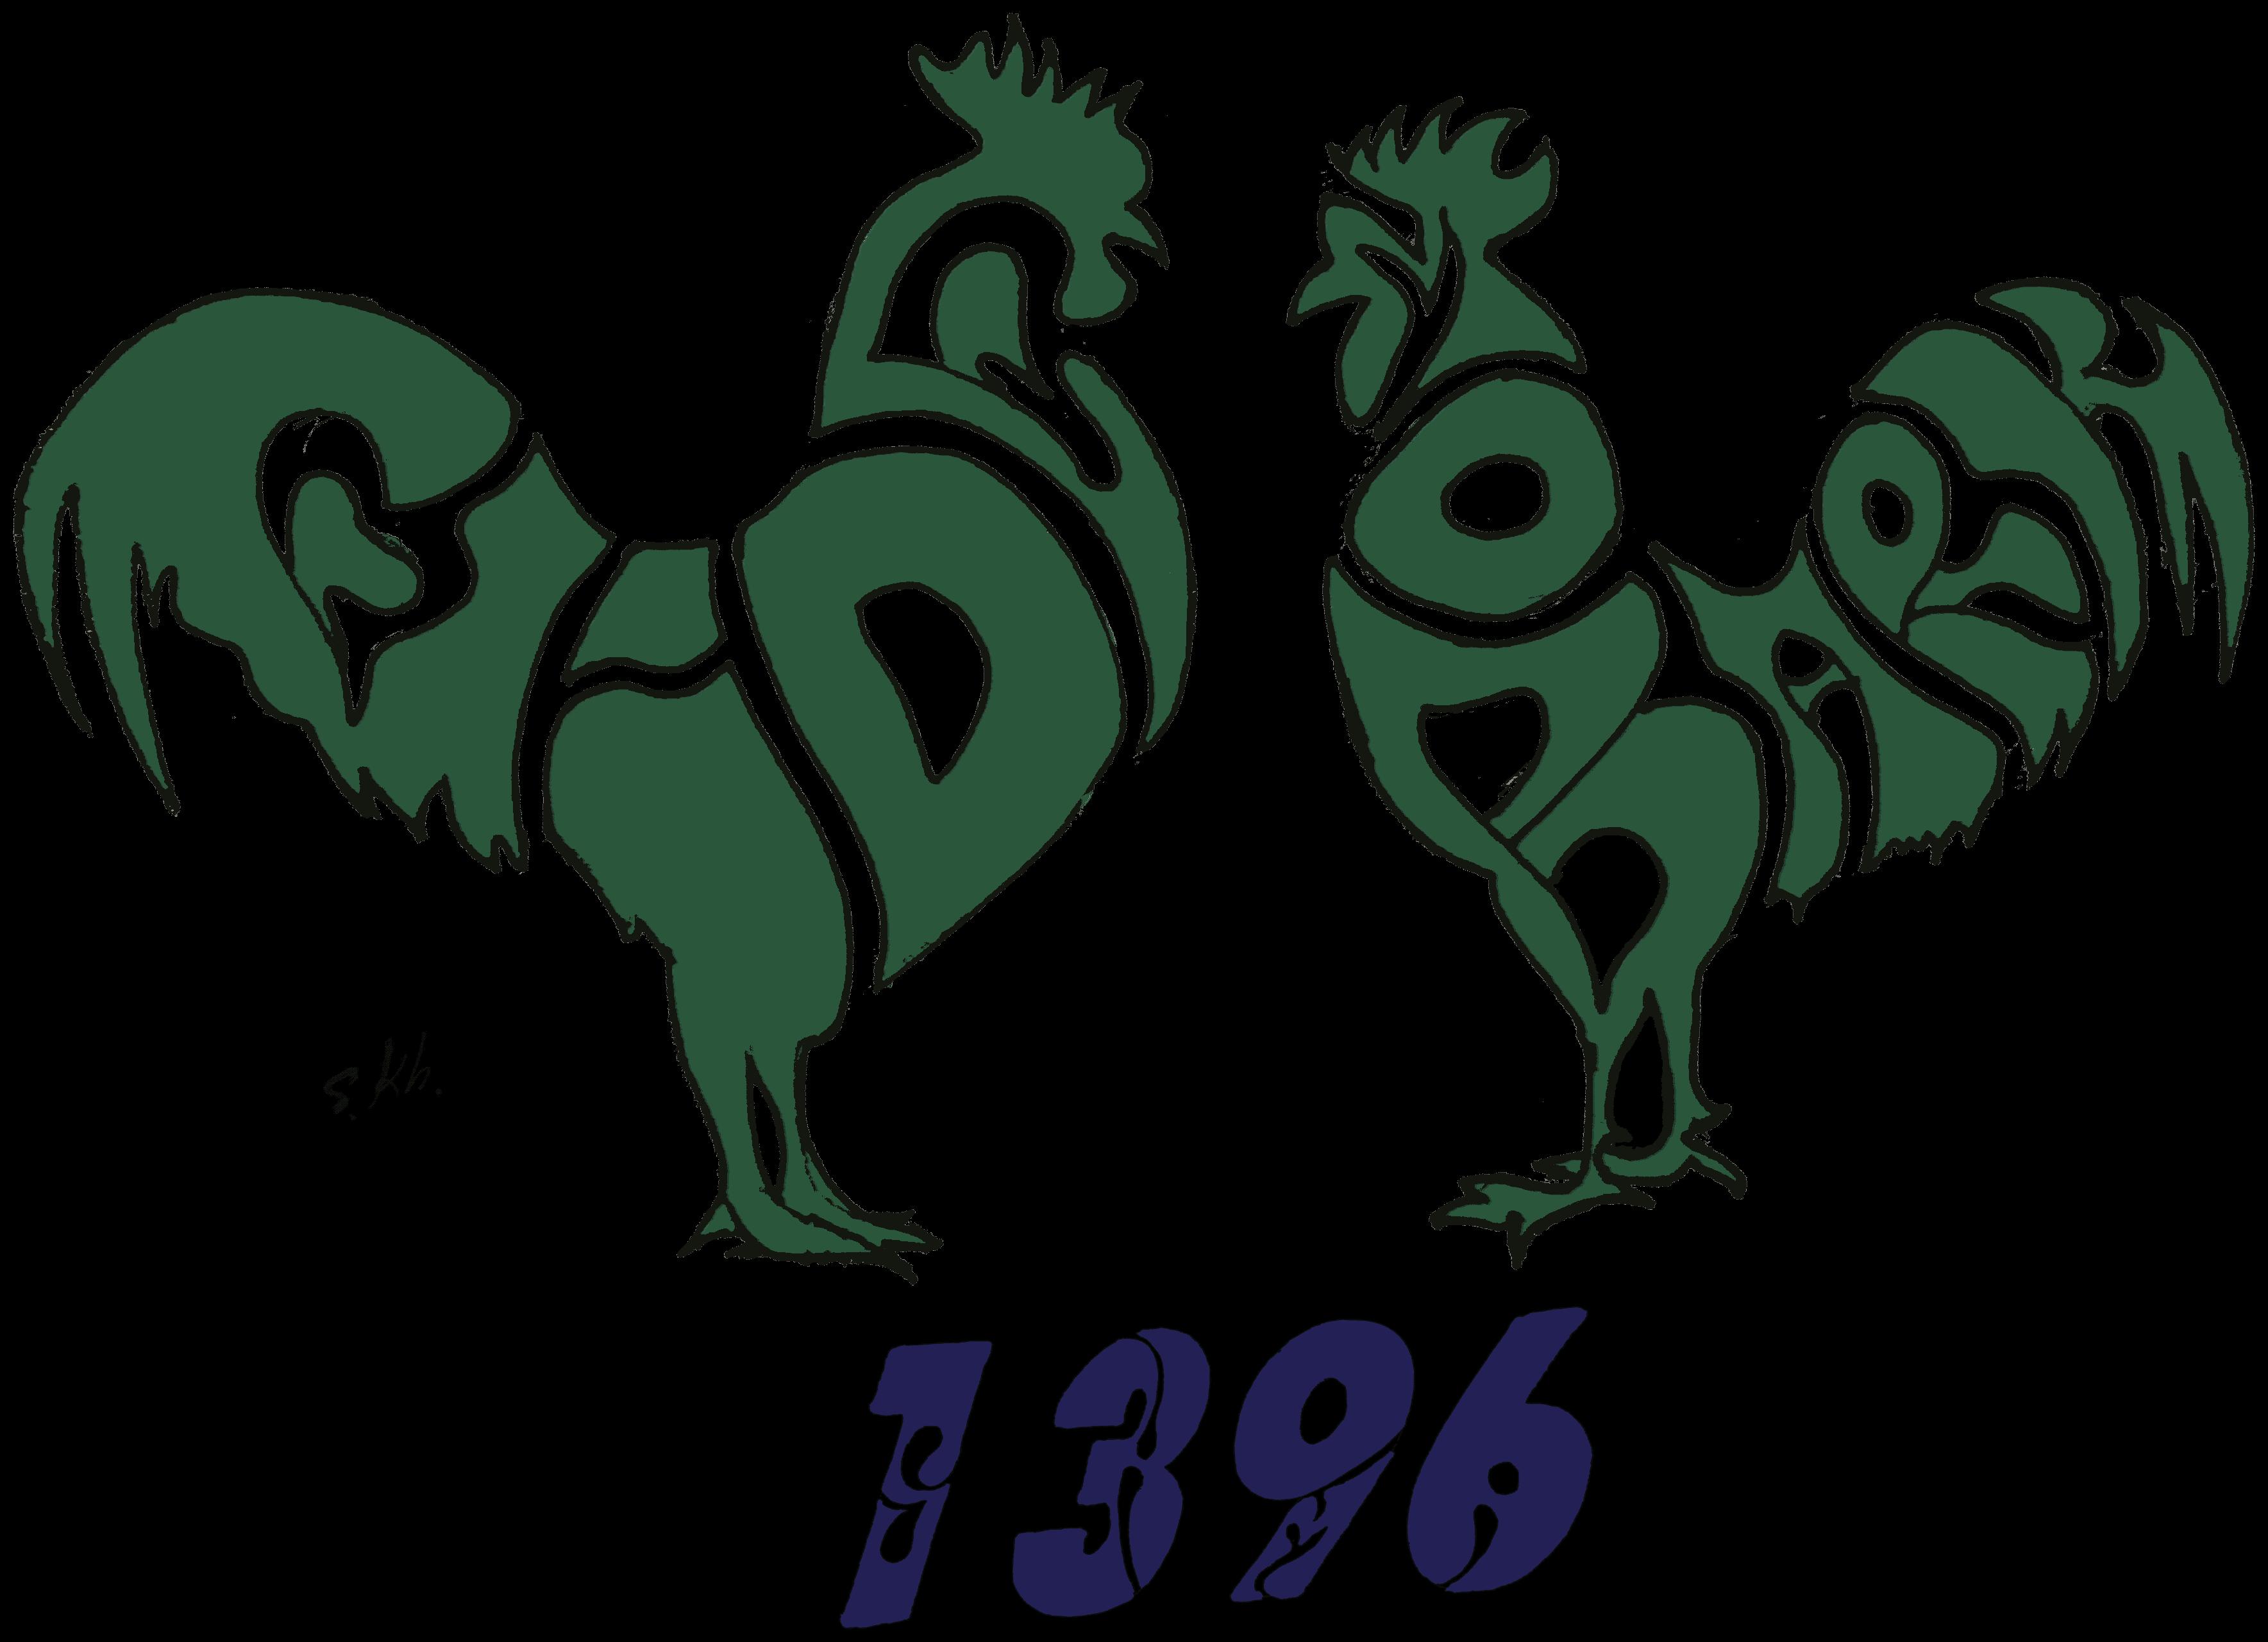 Eide Shoma Mobark 1396